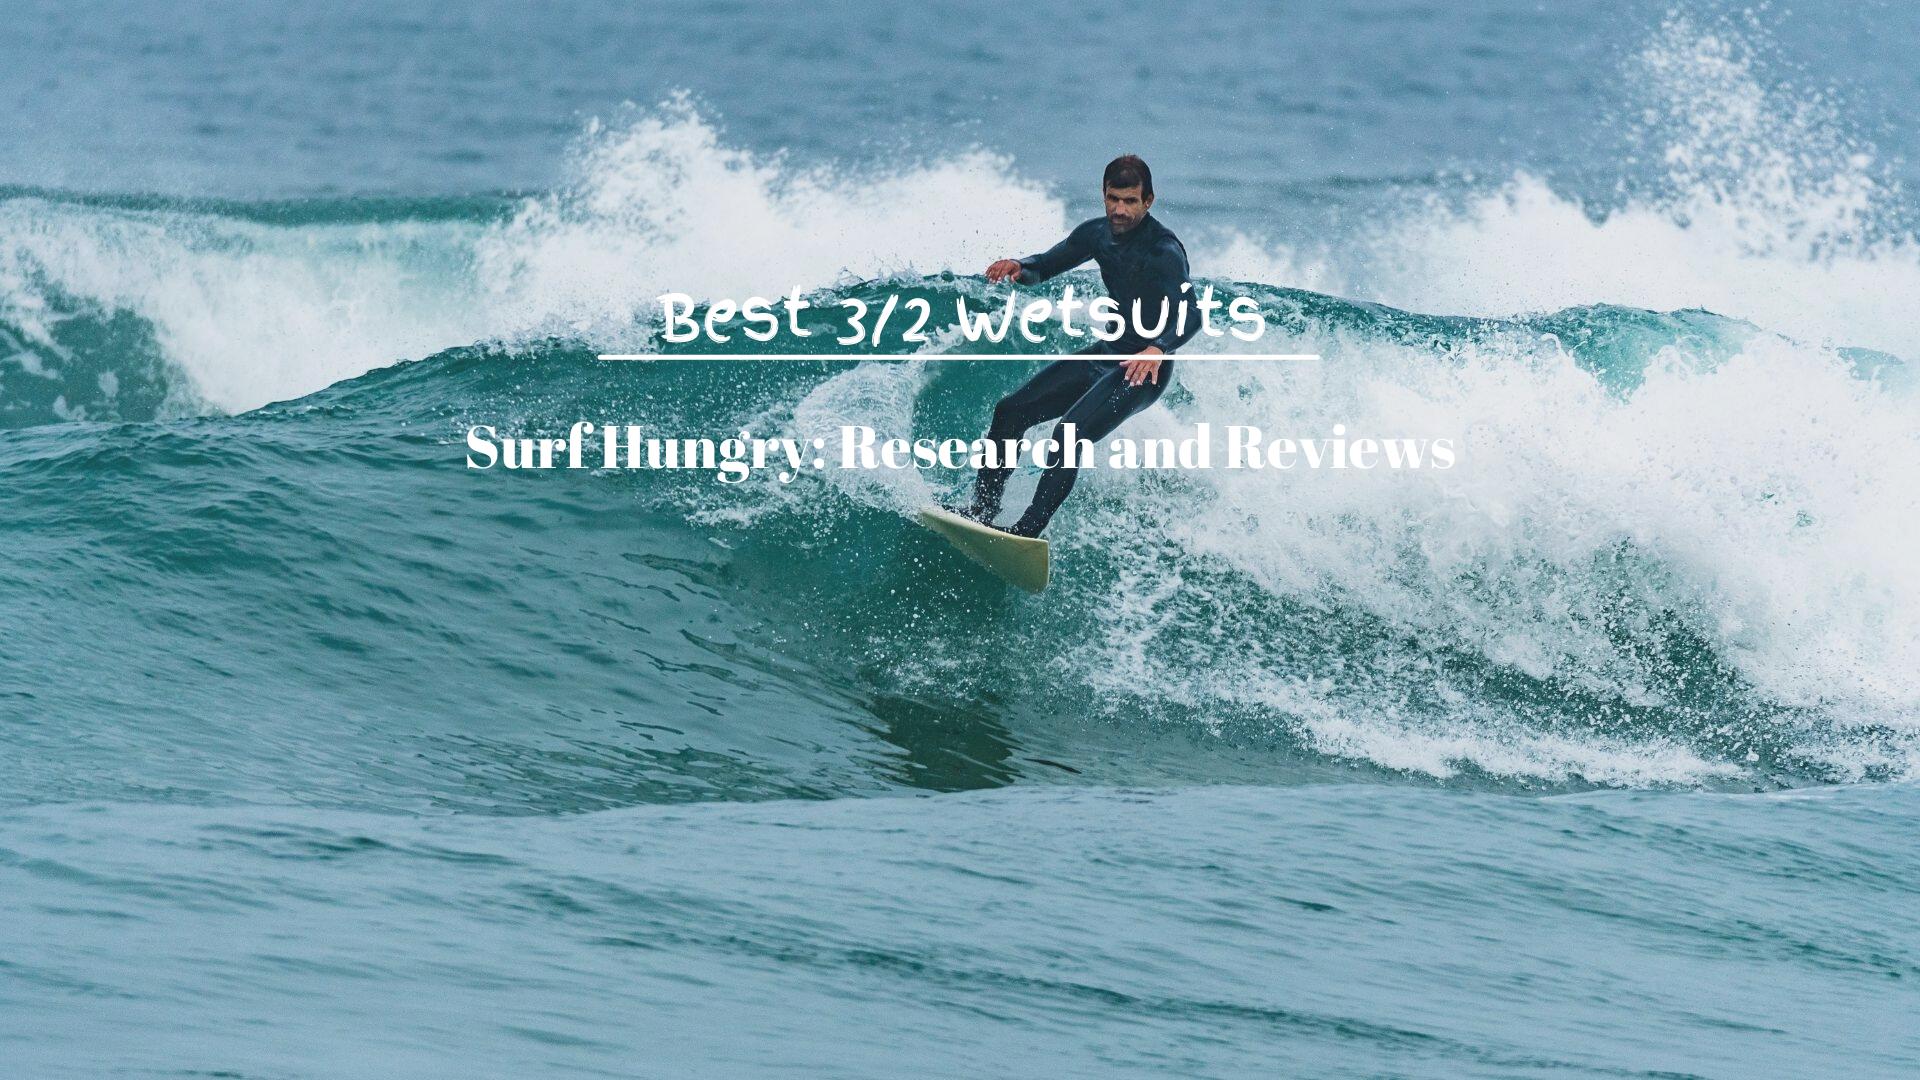 Best 3/2 Wetsuits